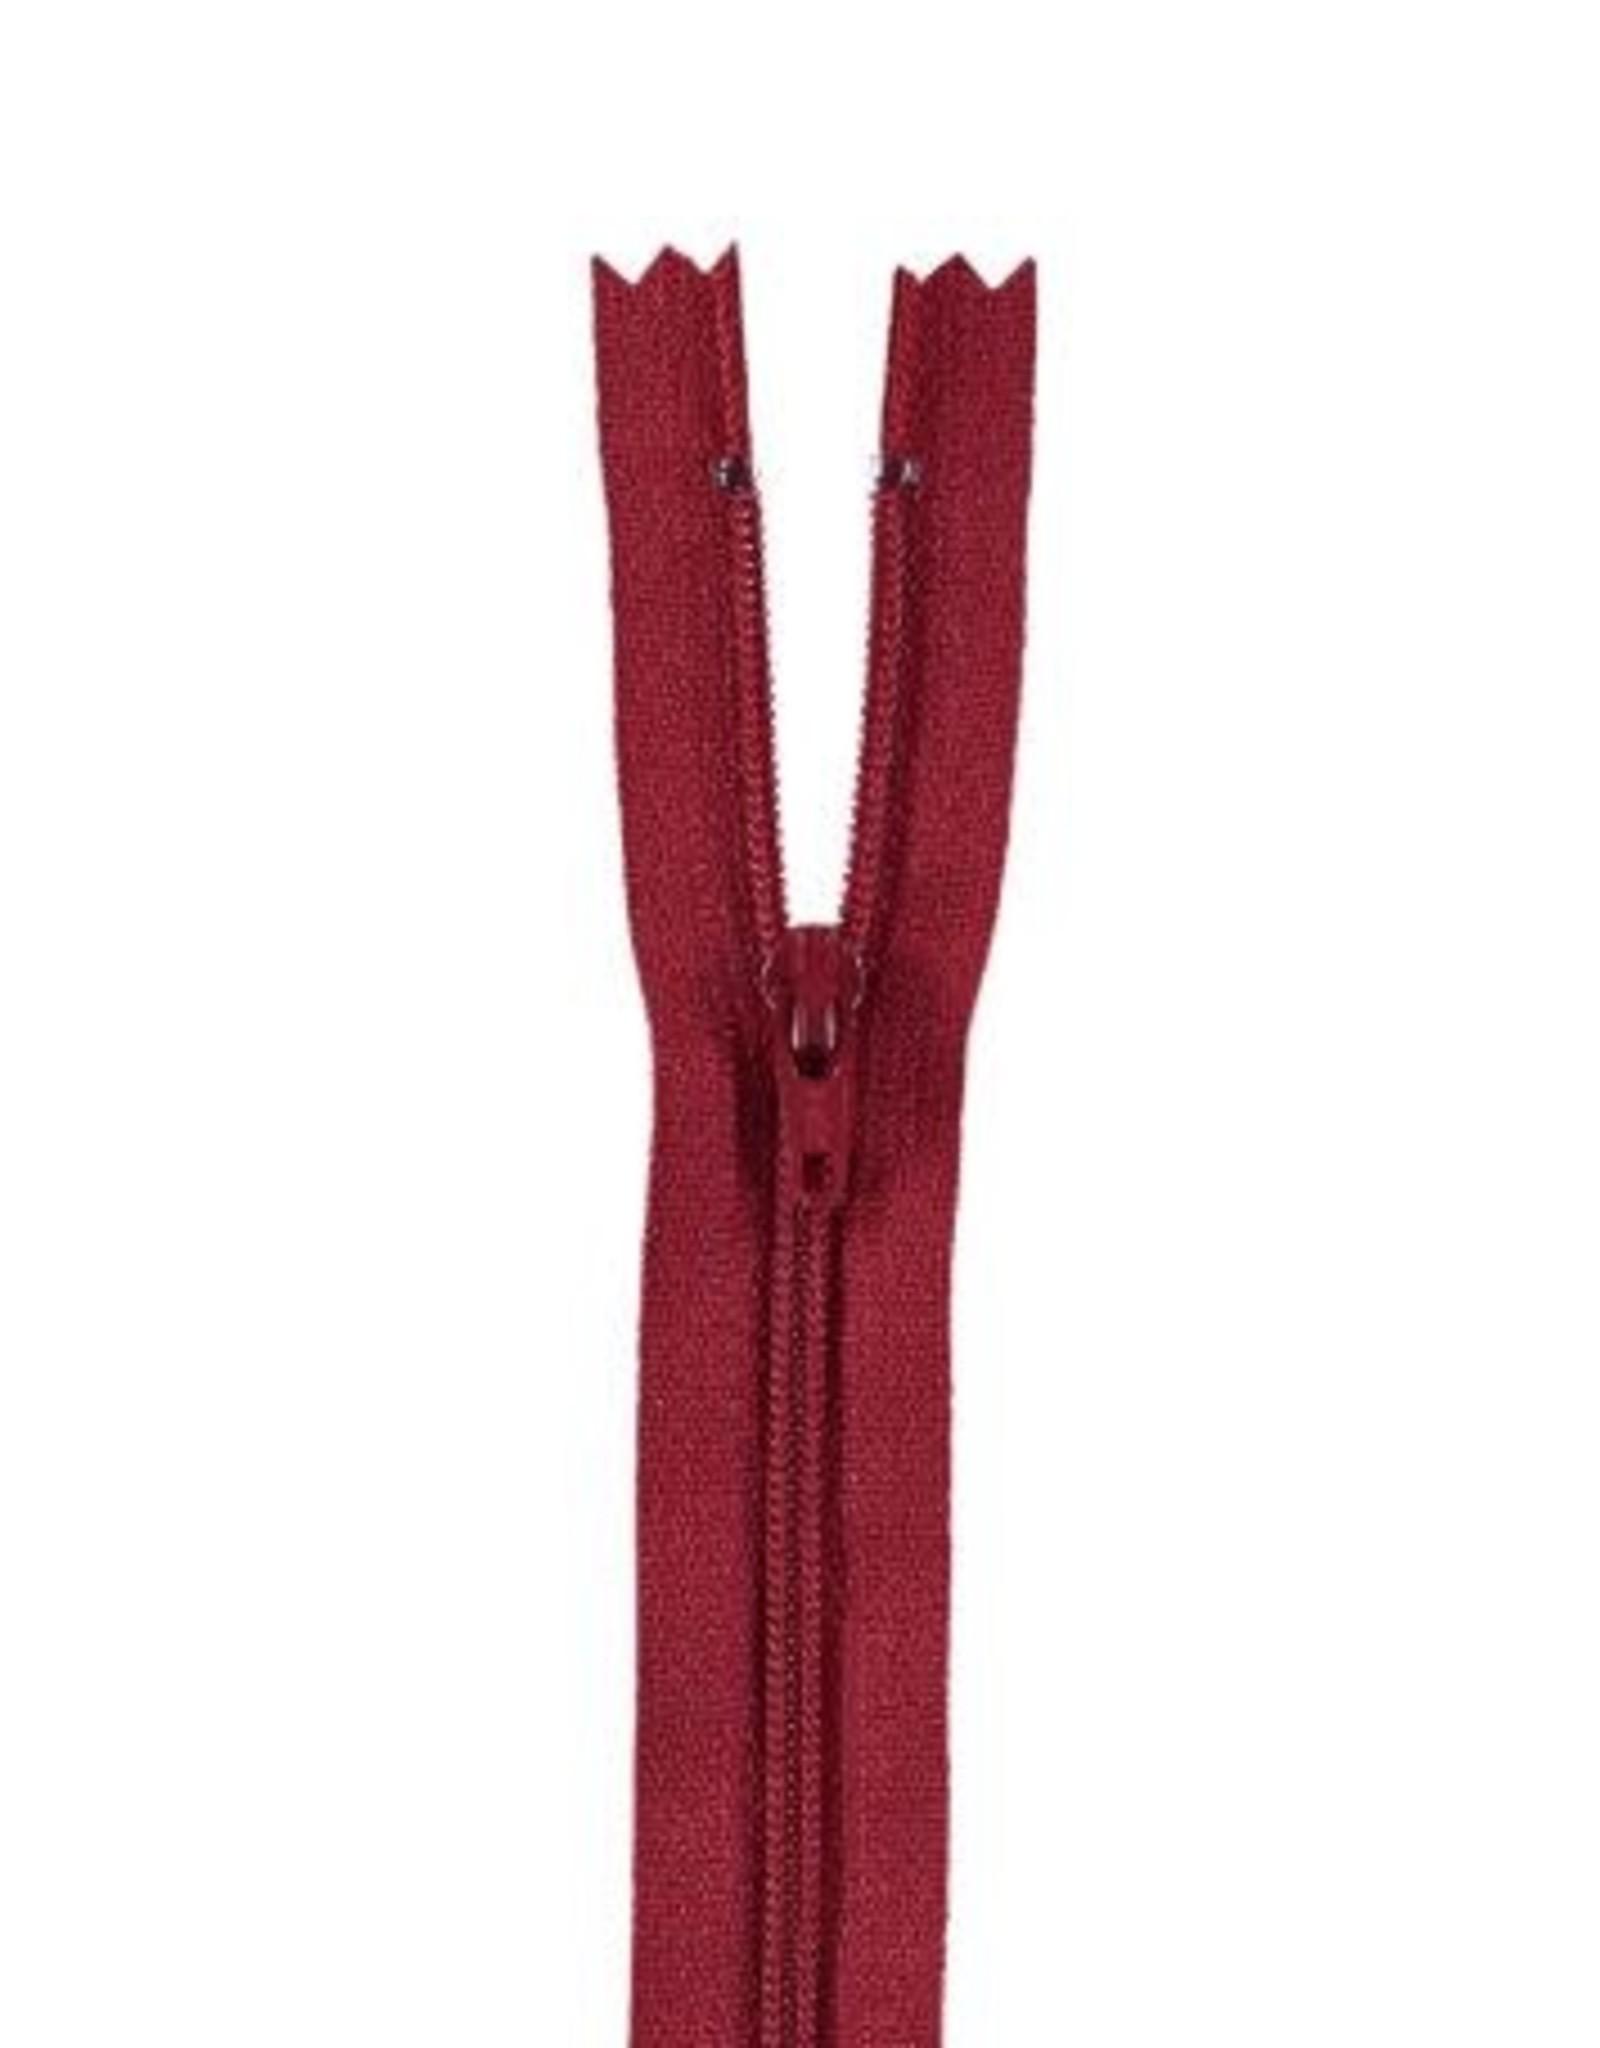 YKK Spiraalrits niet-DB 3mm donker rood 520-20cm